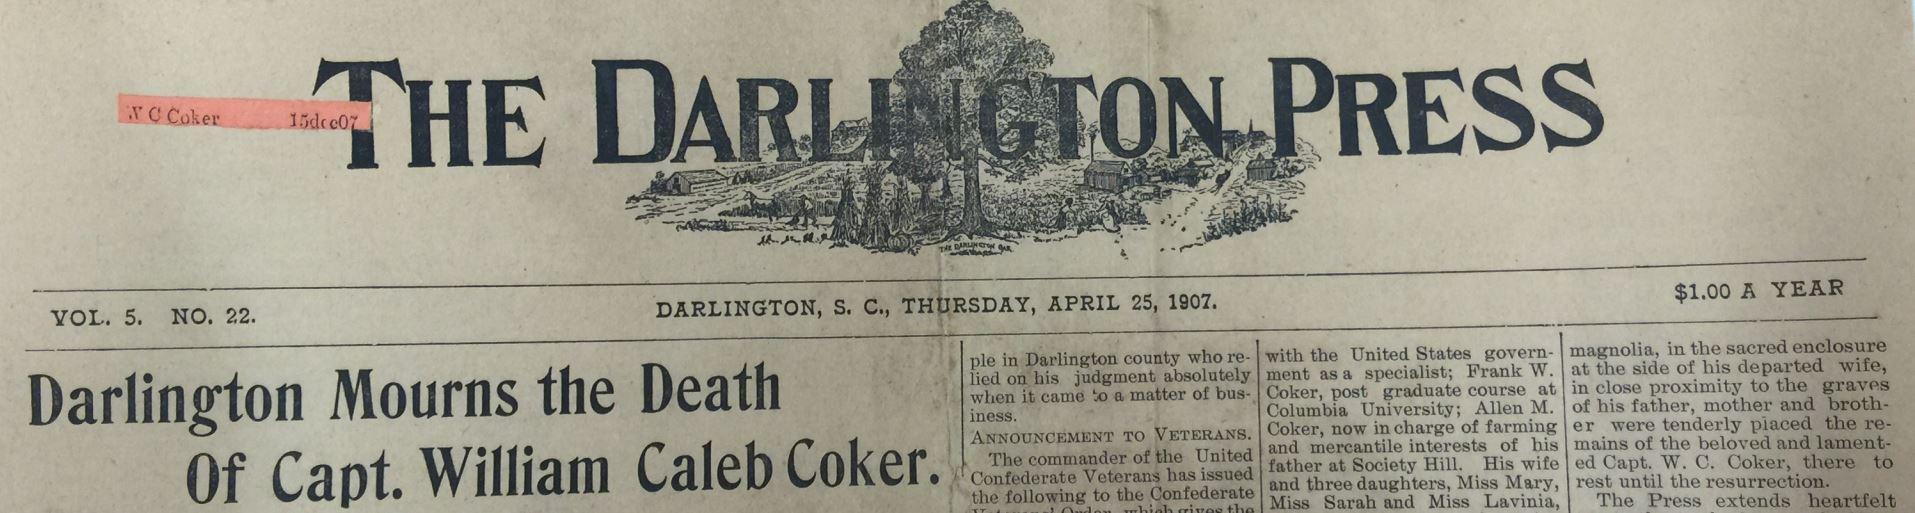 darlington Press.JPG